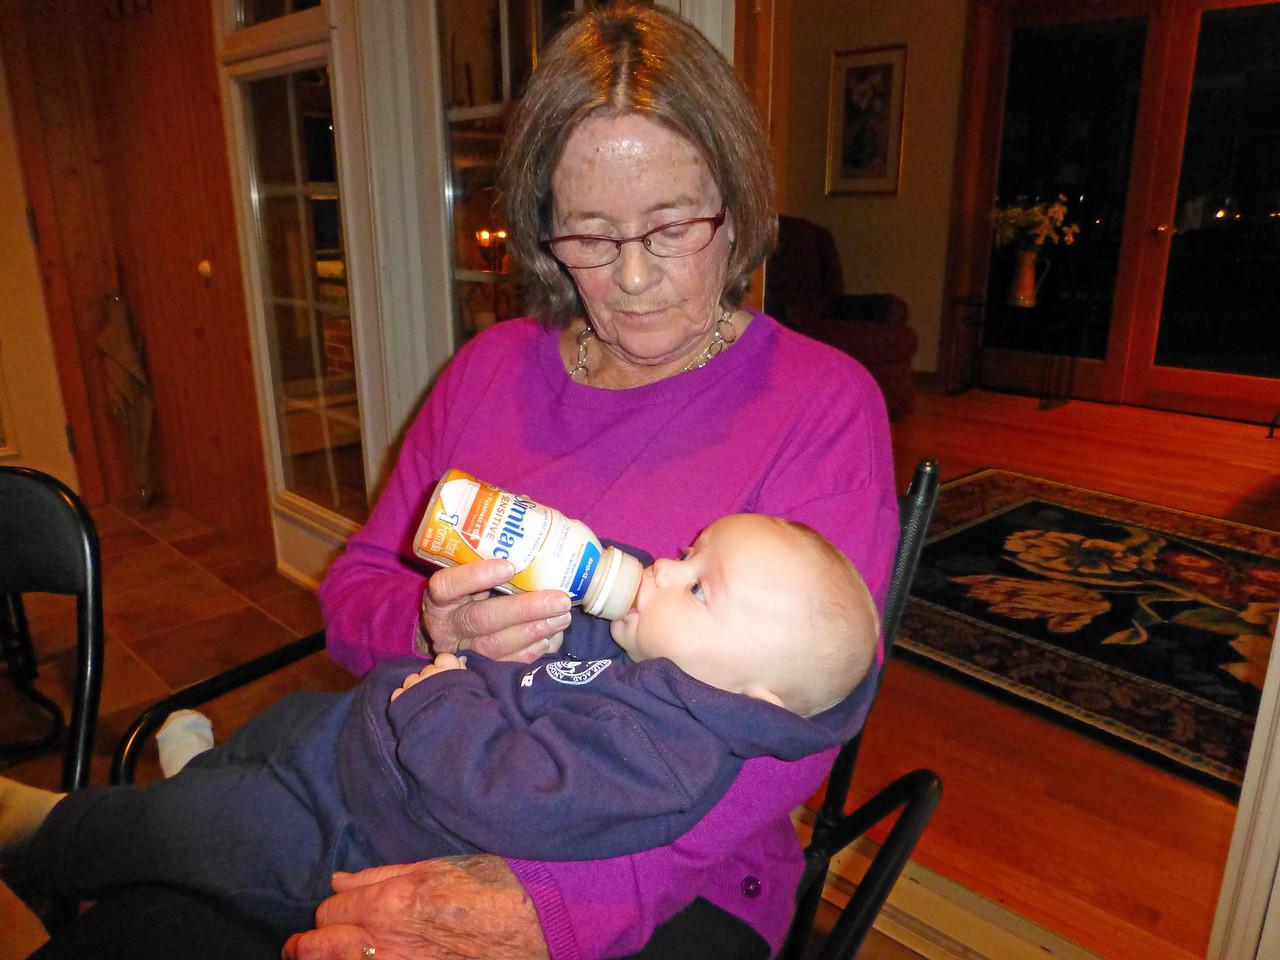 Mary Feeding Jack Thanksgiving 2015